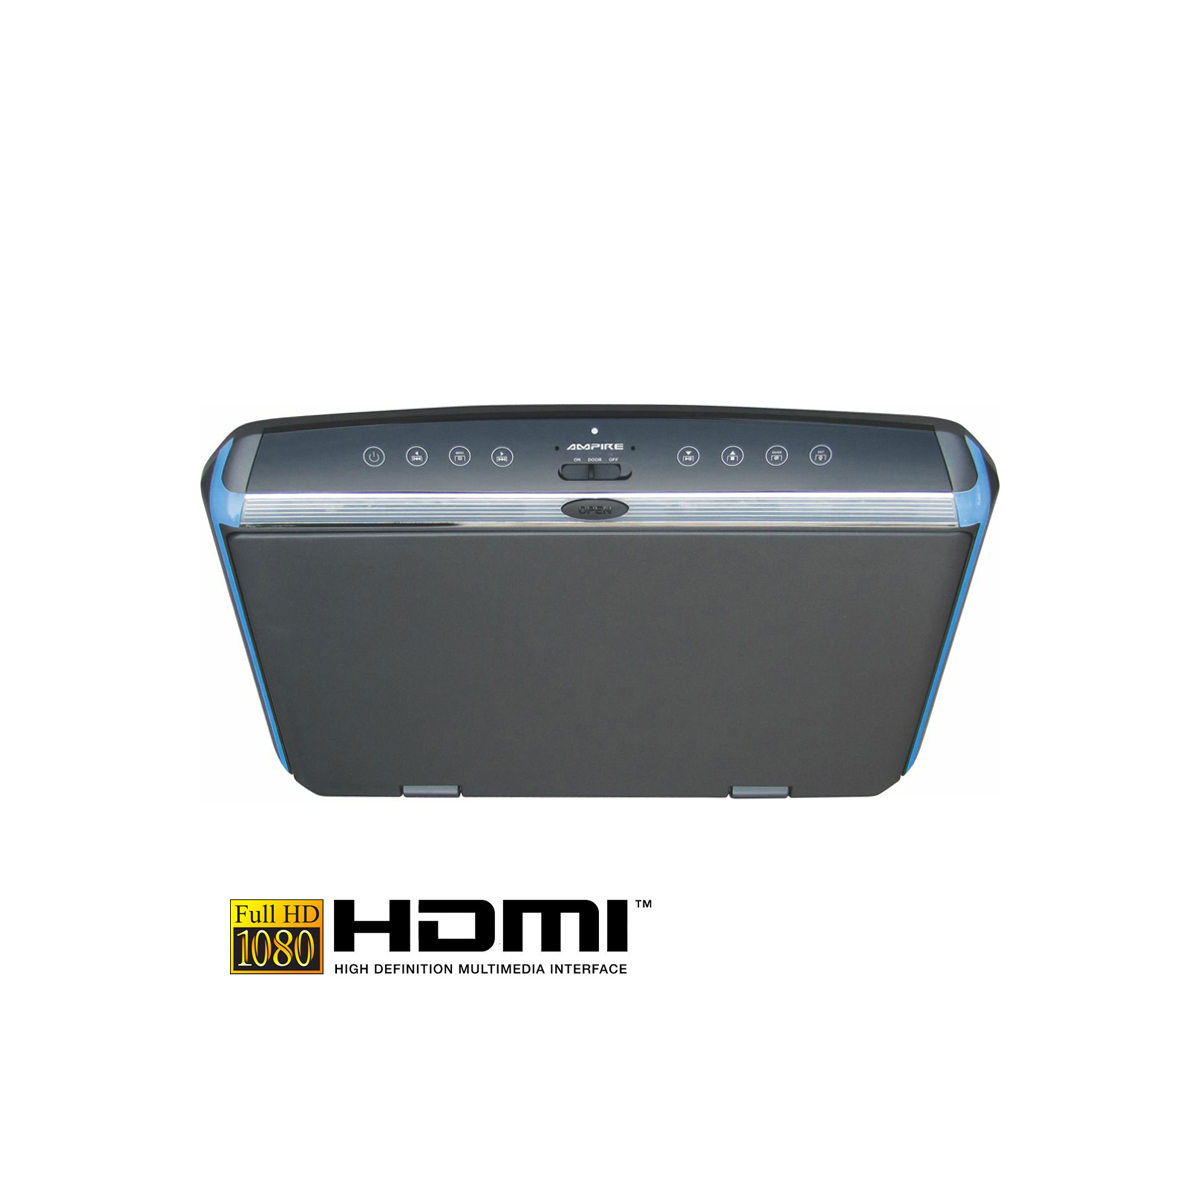 ampire full hd deckenmonitor 10 1 39 39 mit hdmi. Black Bedroom Furniture Sets. Home Design Ideas